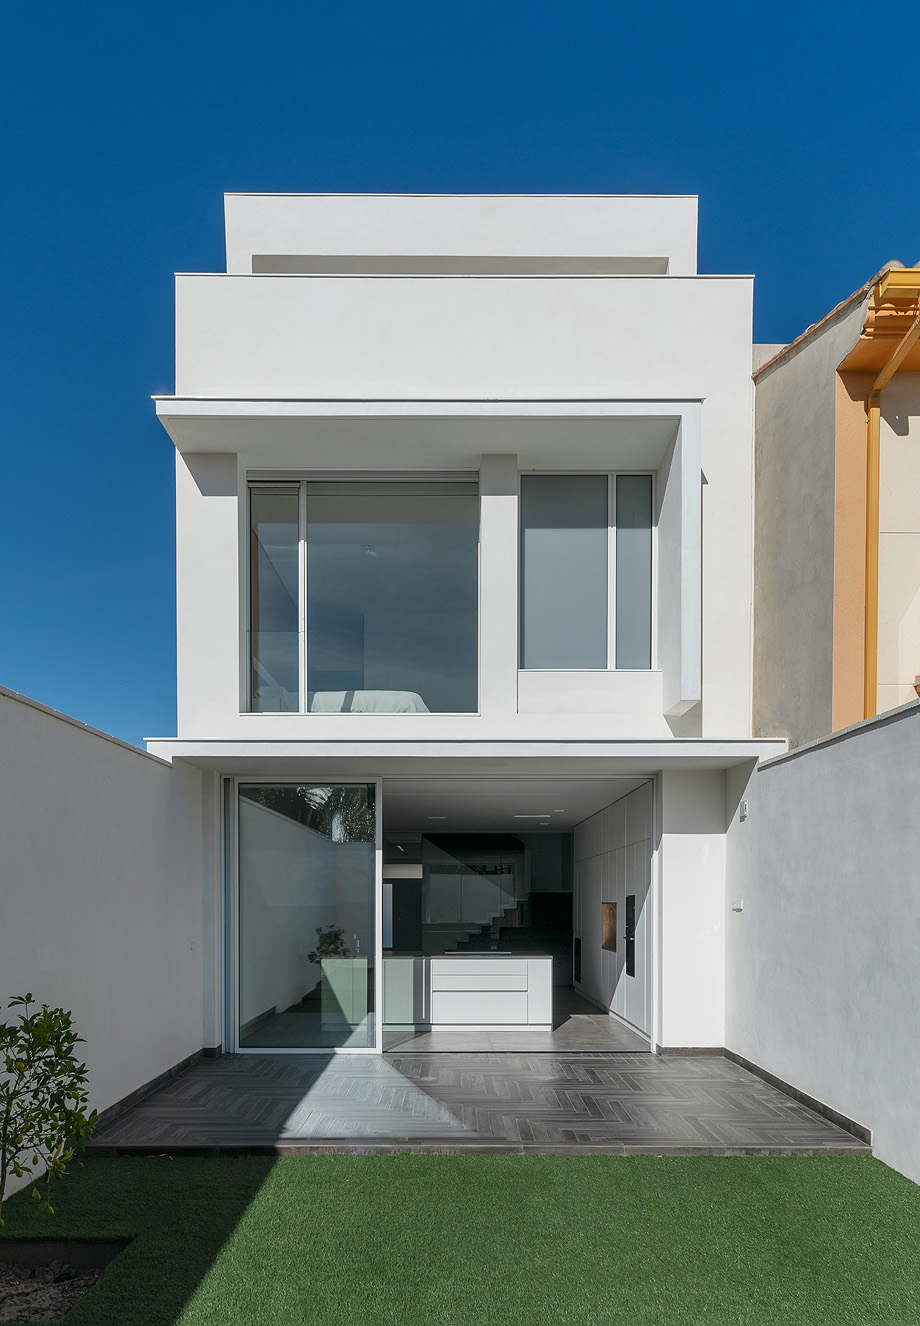 casa ribera de carles faus arquitectura (15) - foto adrian mora maroto